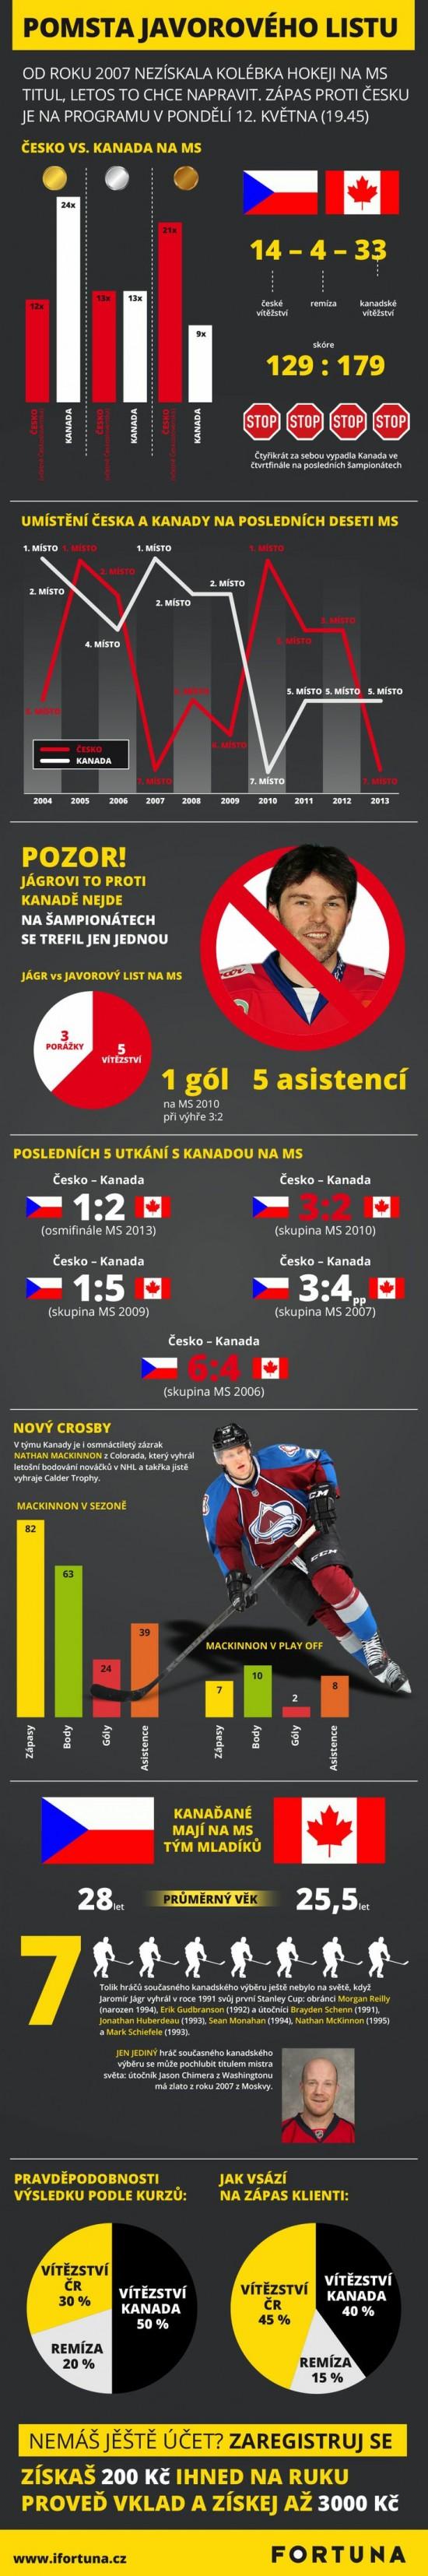 Pomsta javoroveho listu - infografika